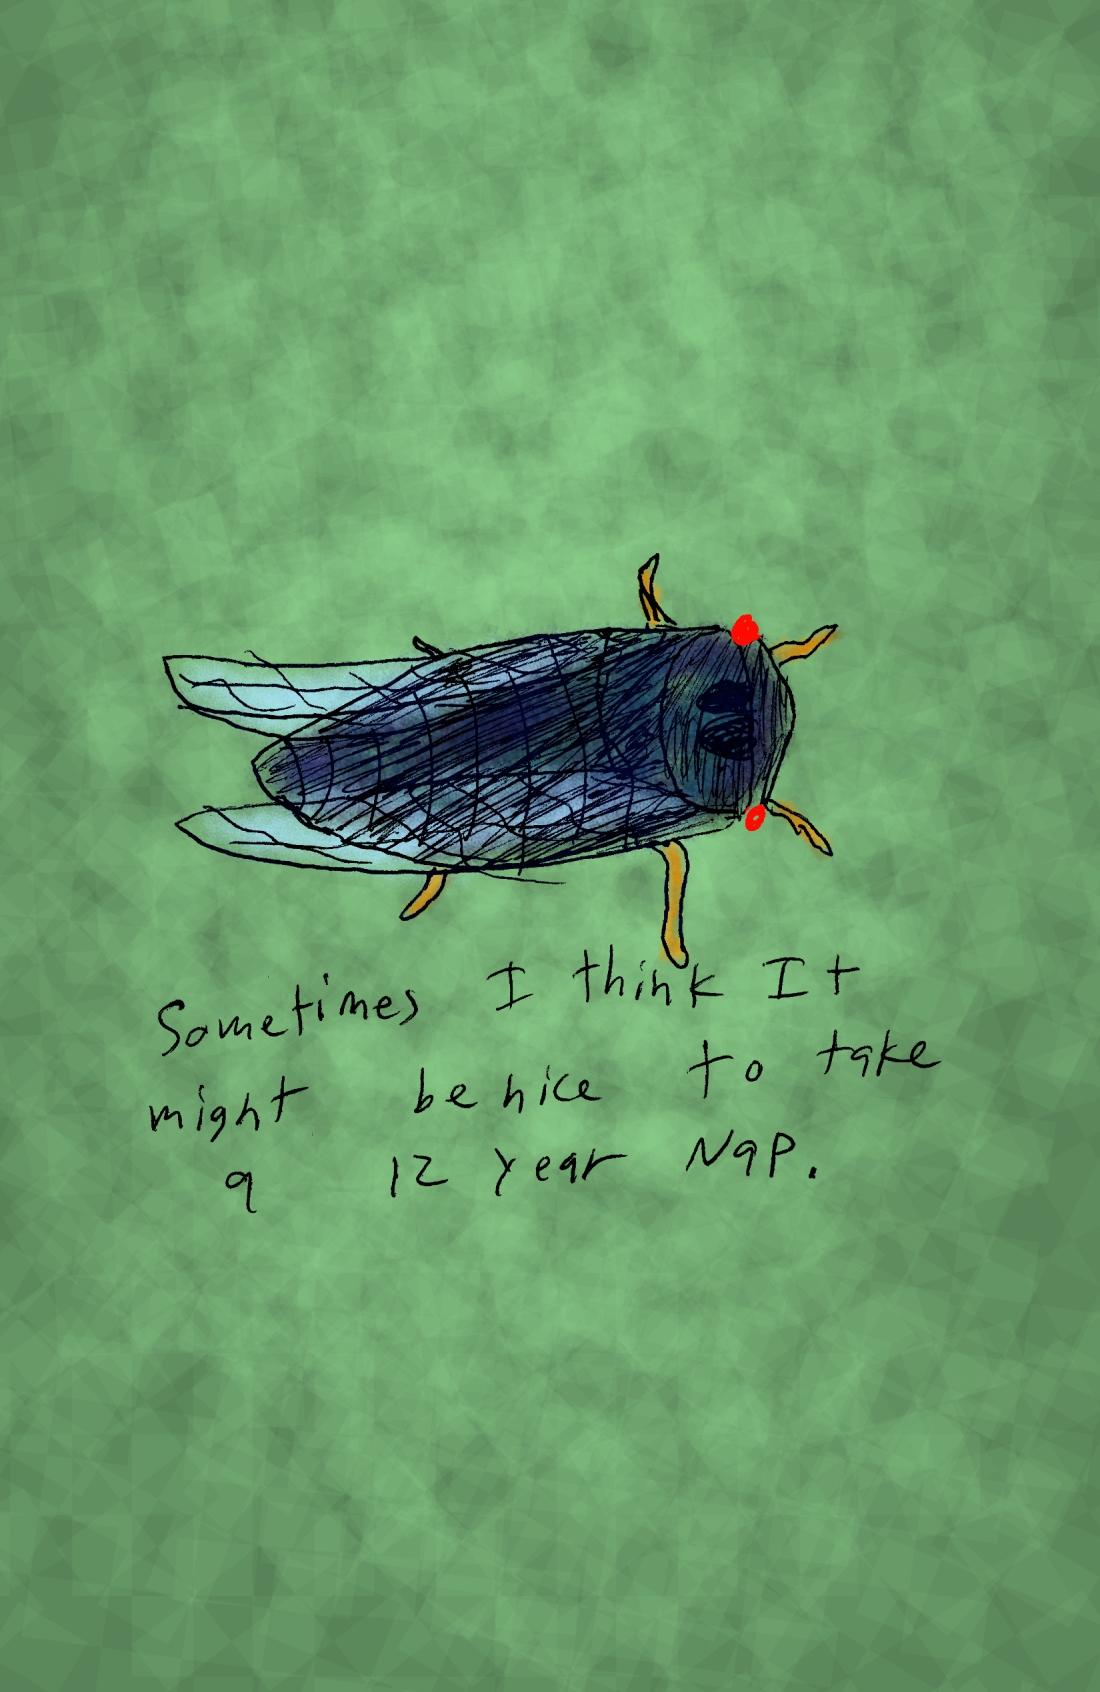 bugs pg 19 c